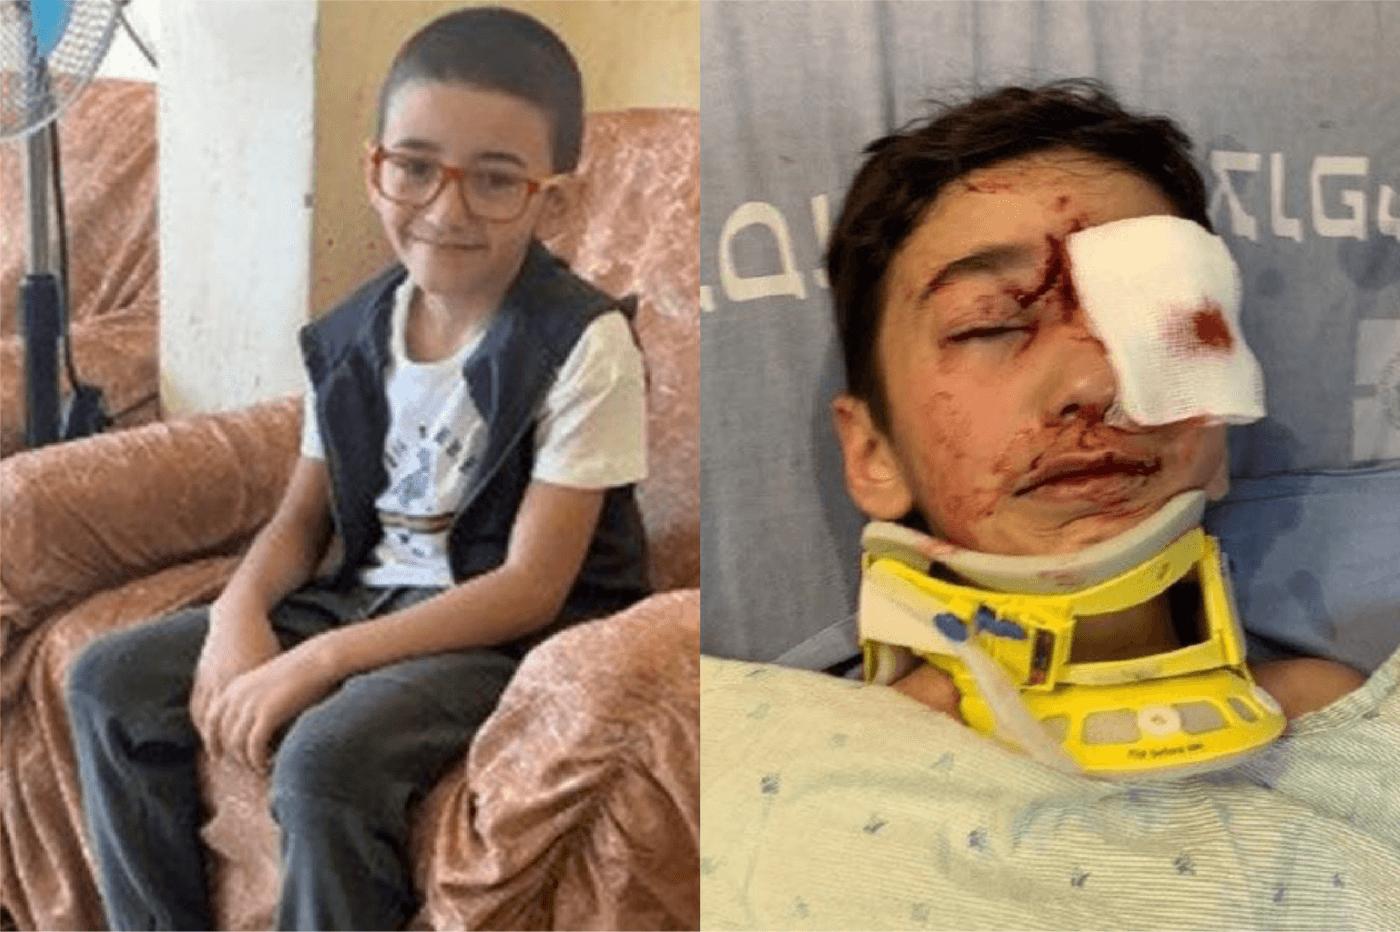 Palestinian boy, 8, loses eye after being shot by Israeli police in Jerusalem – Mondoweiss